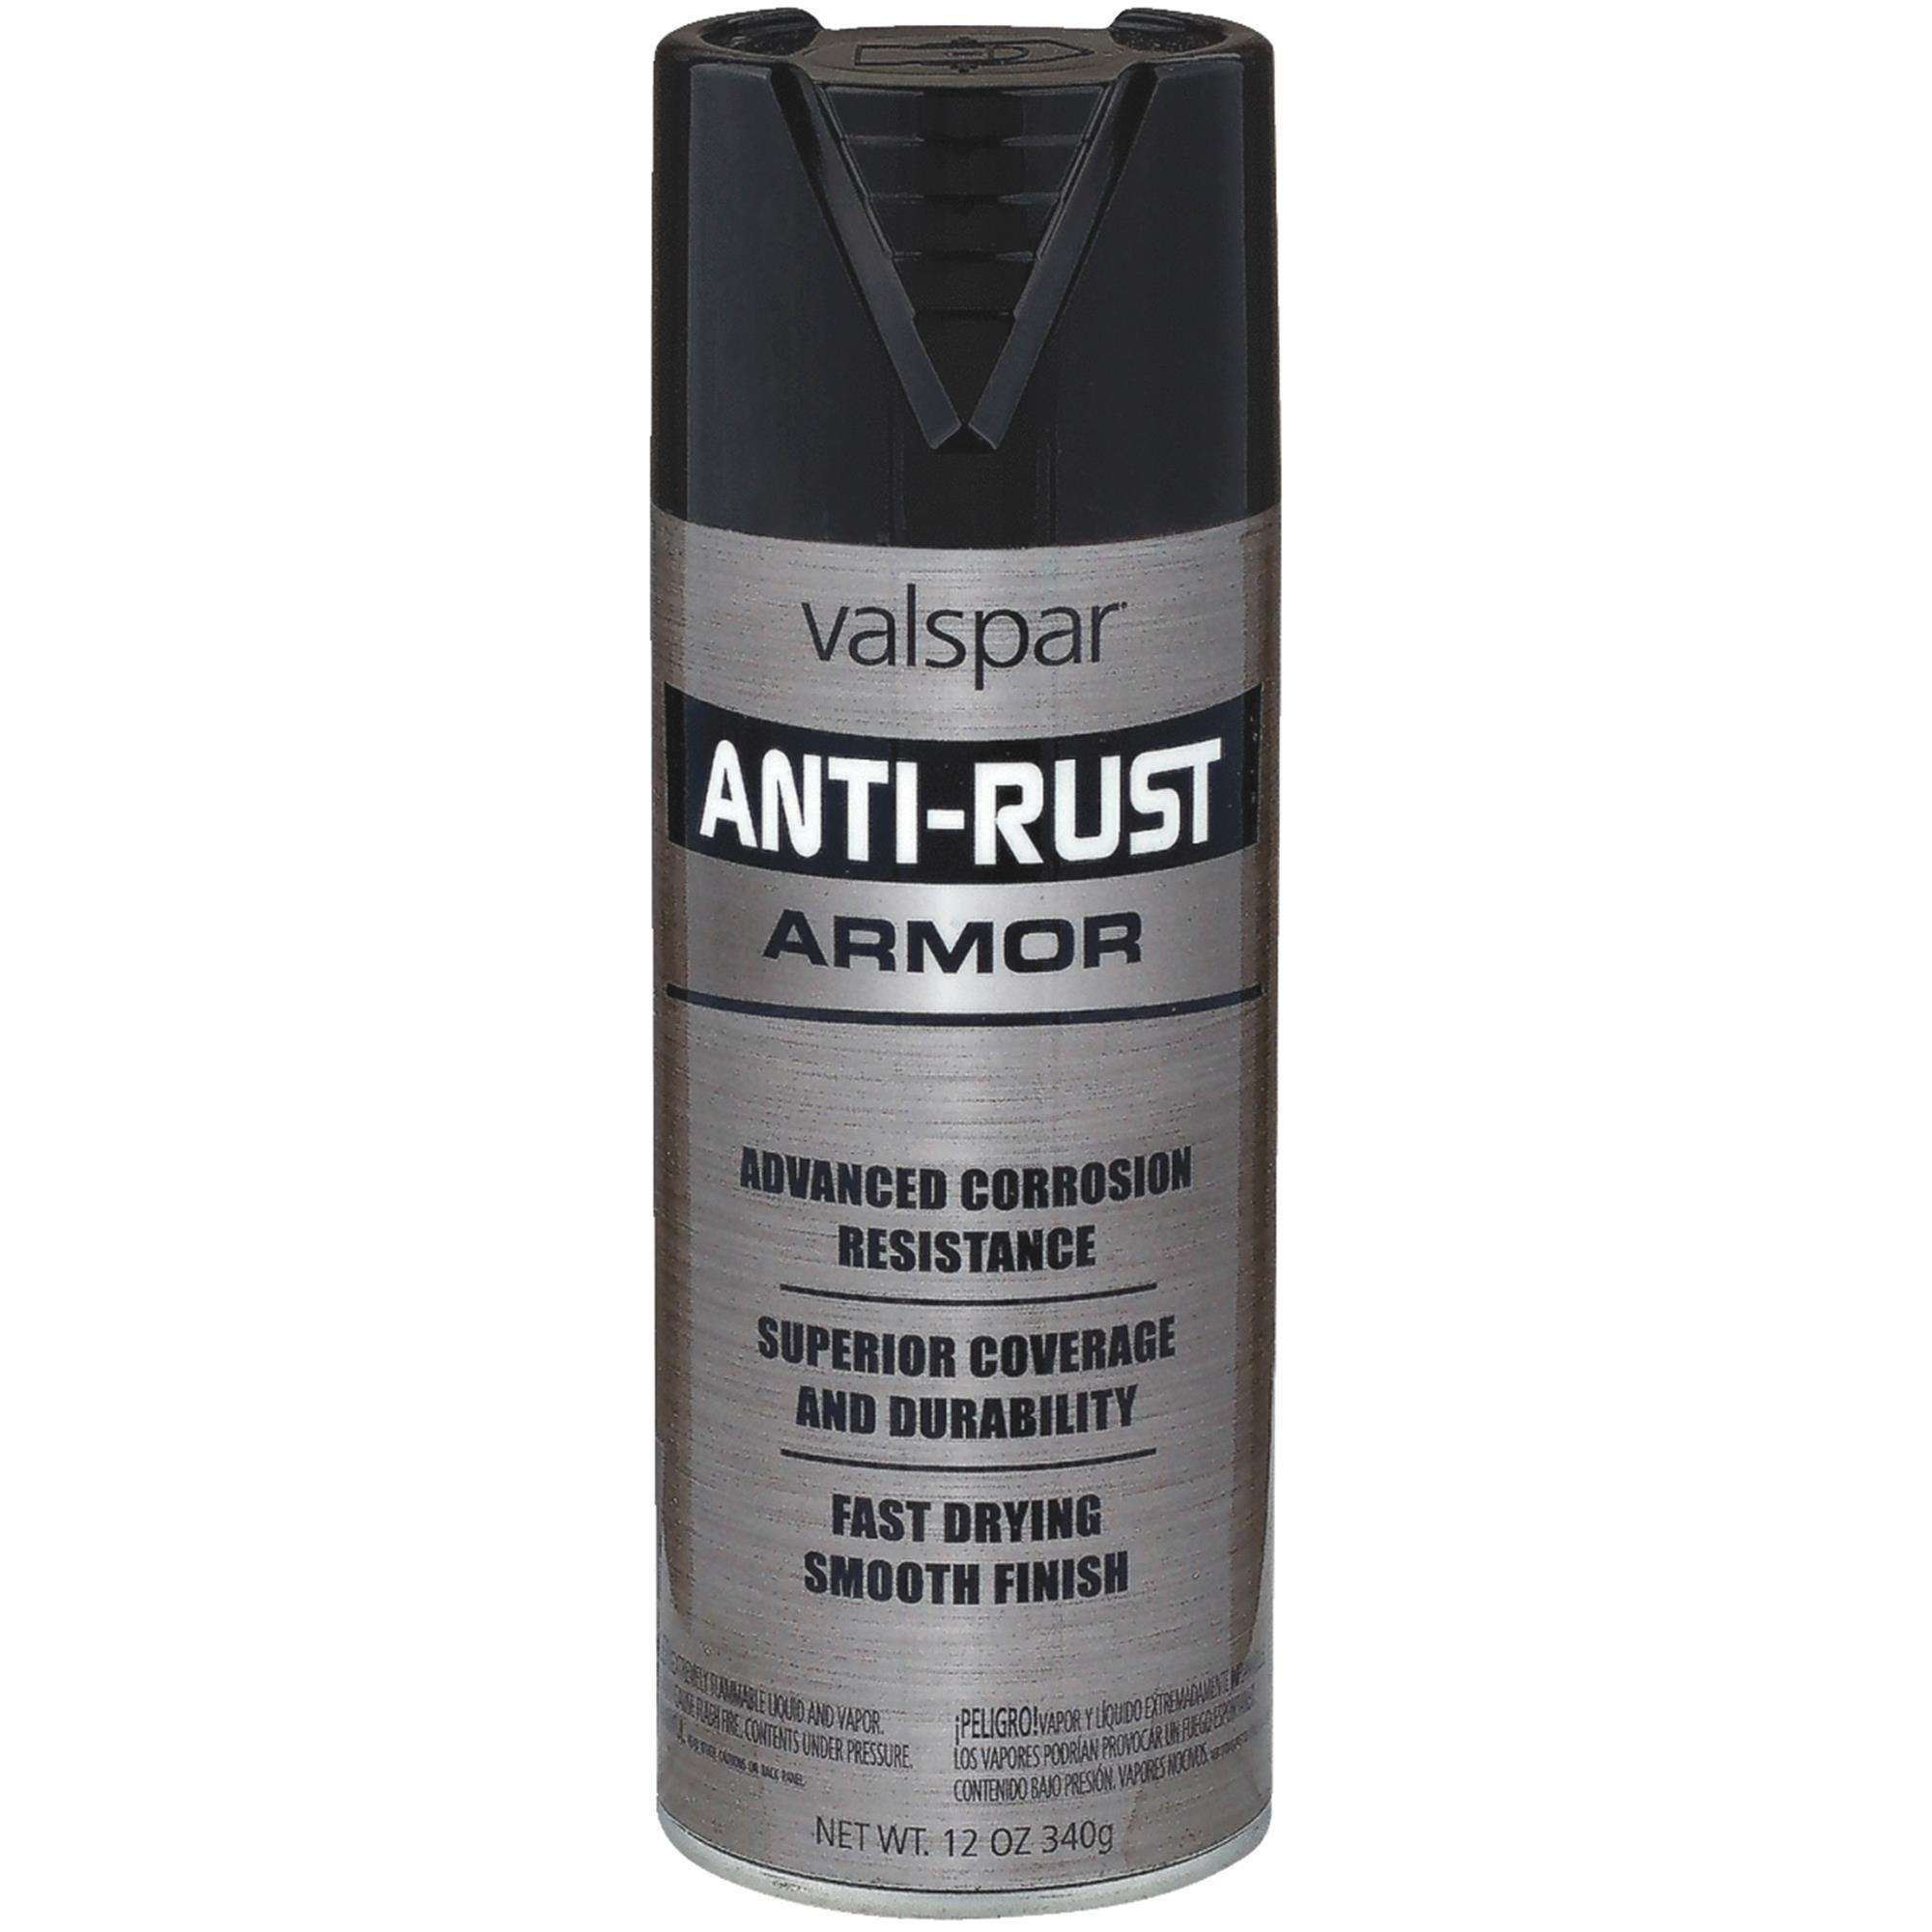 Valspar Armor Anti Rust Spray Paint Enamel   Walmart.com